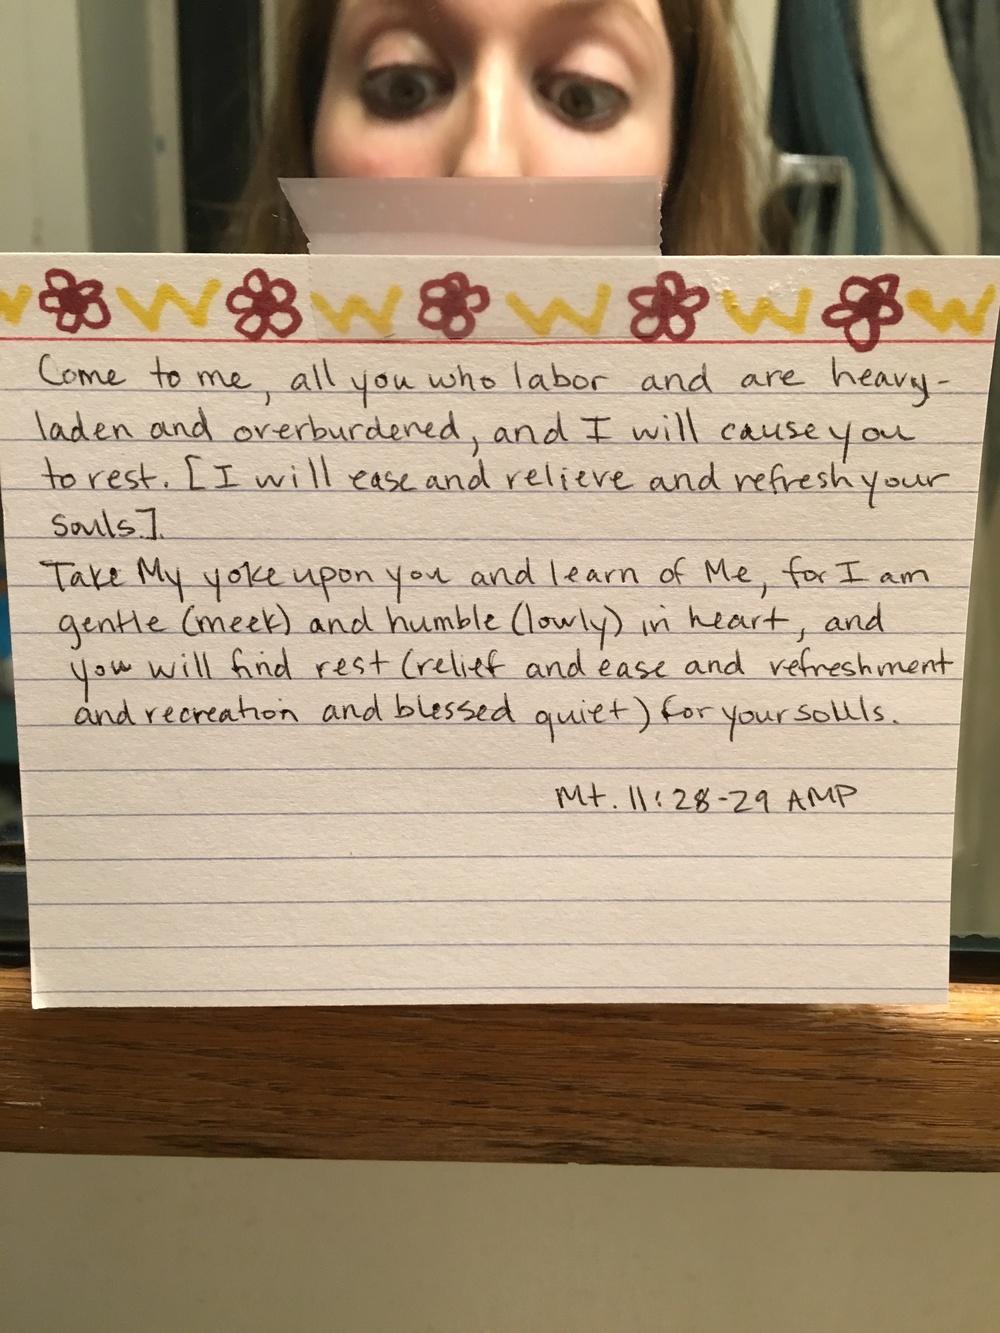 My bathroom scripture bomb lovingly sent from my BFF last fall.